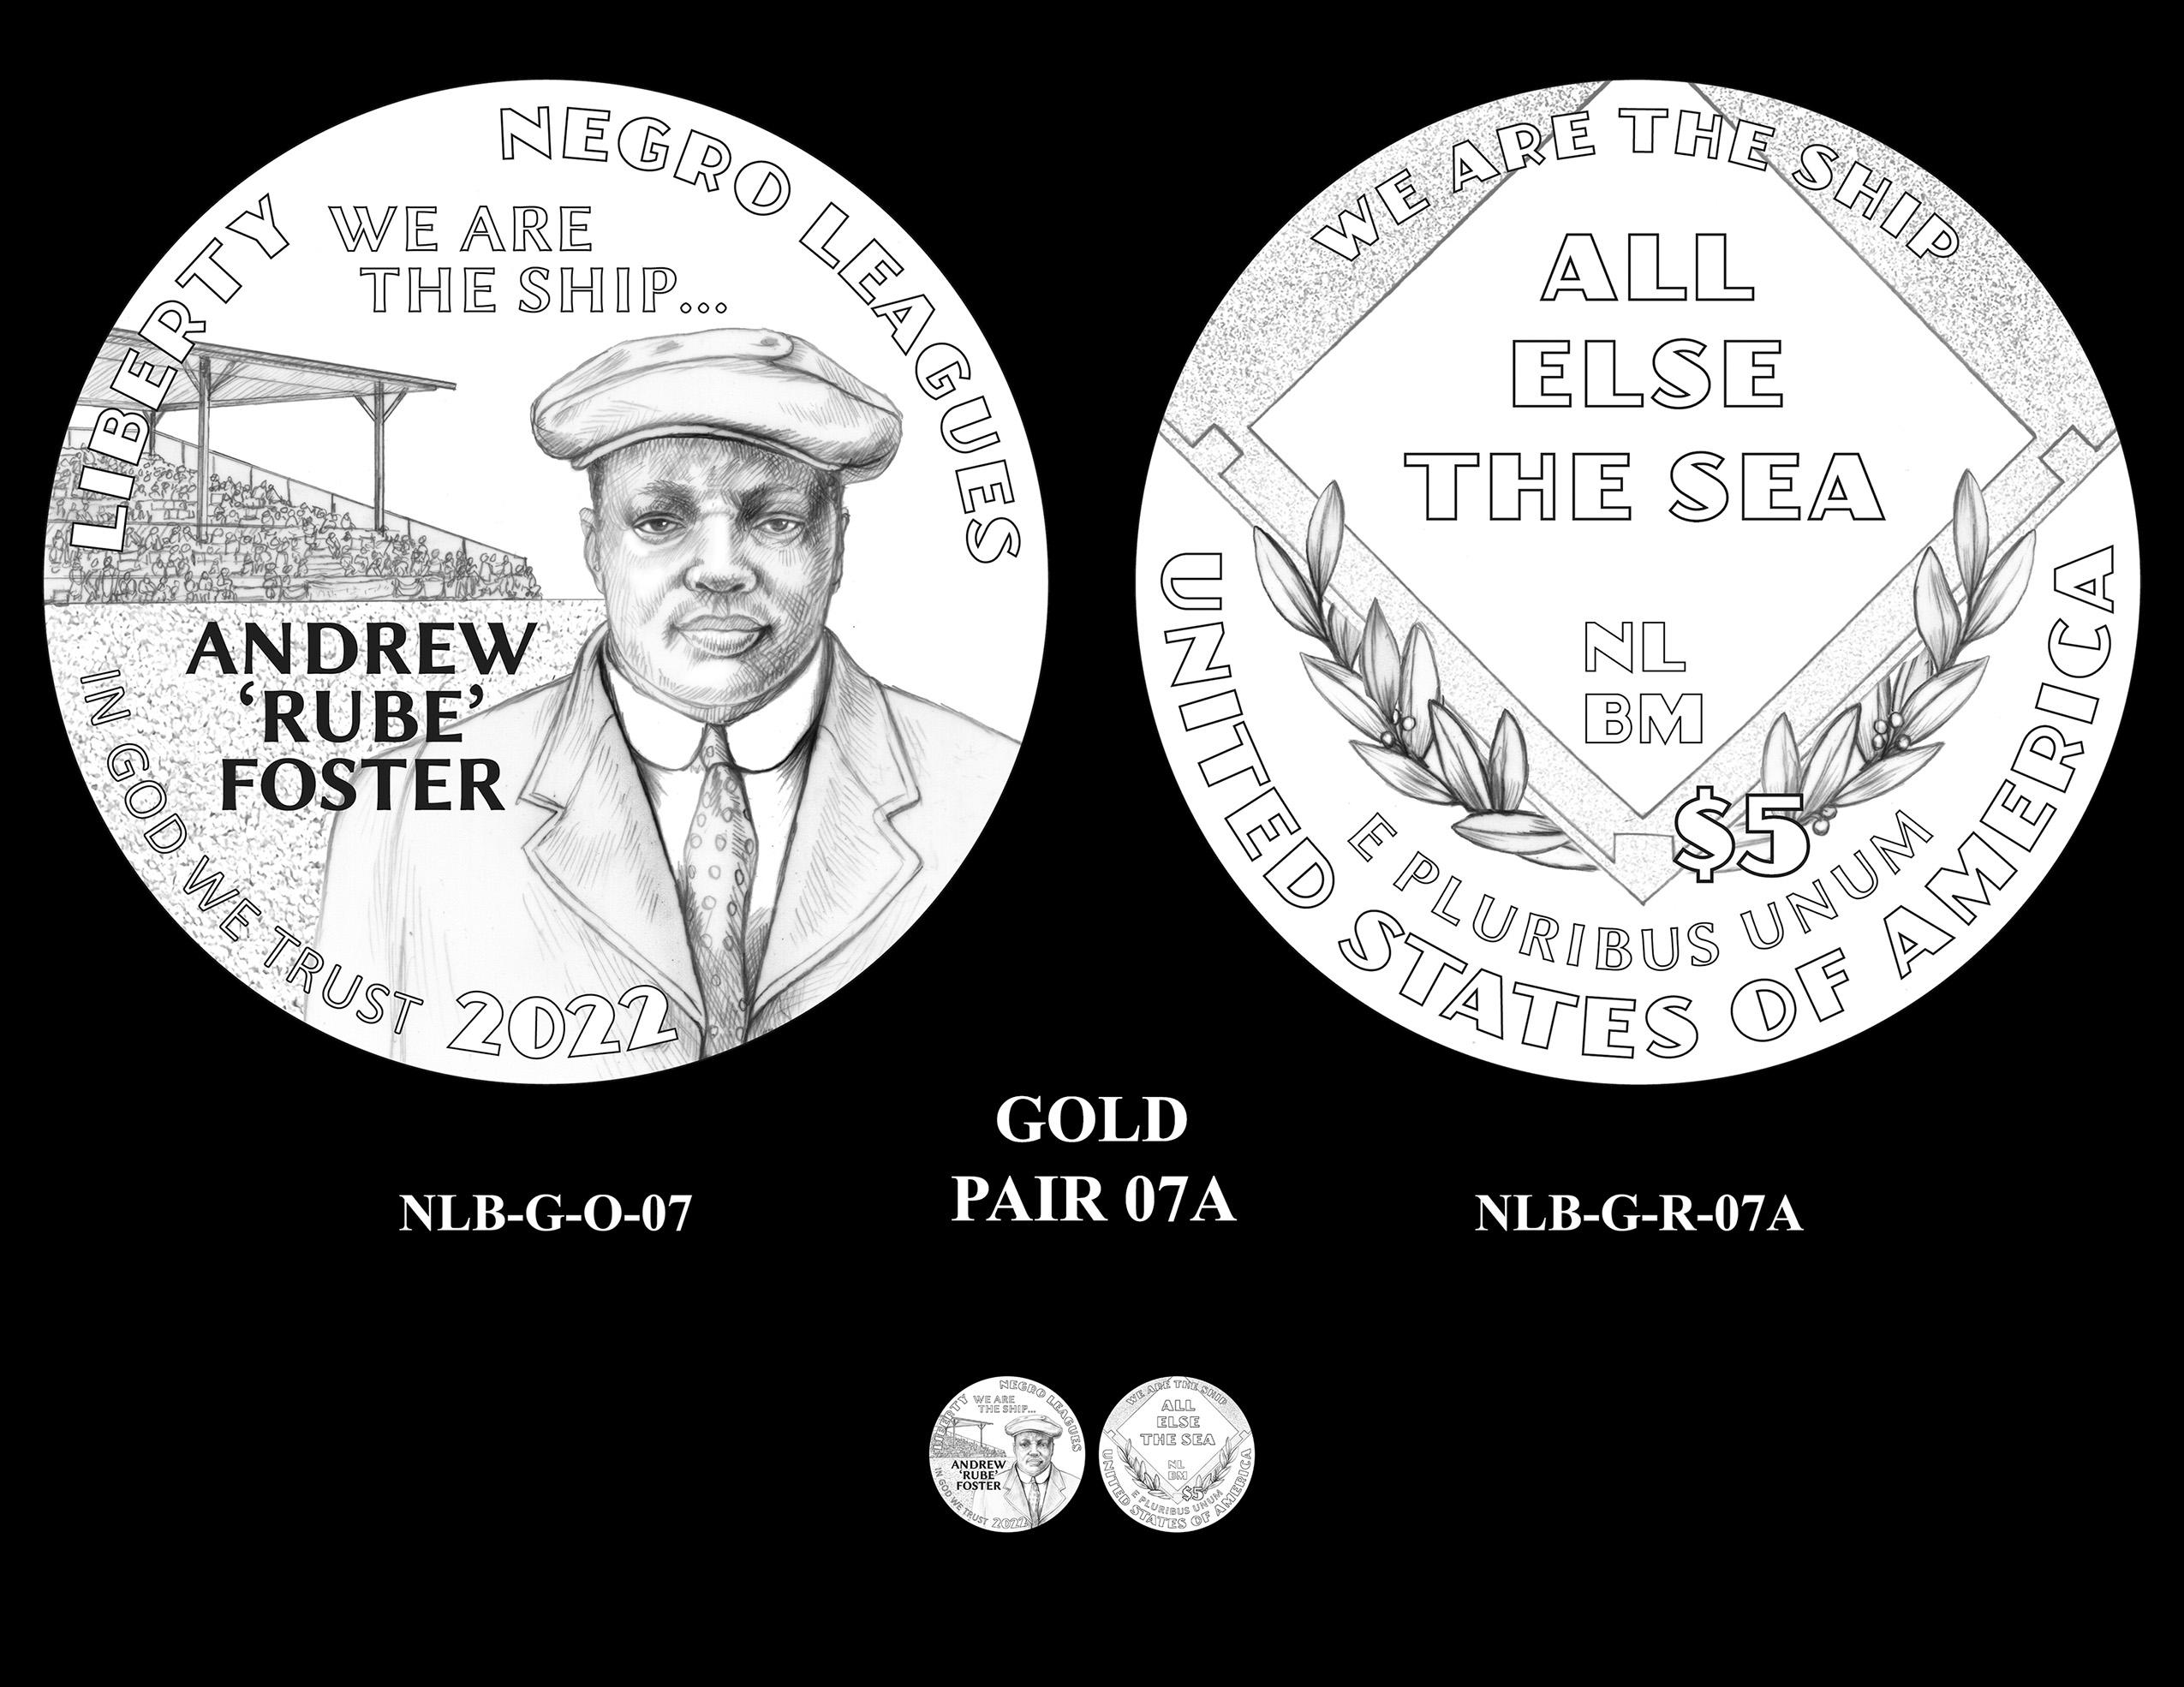 Gold Pair 7A -- Negro Leagues Baseball Commemorative Coin Program